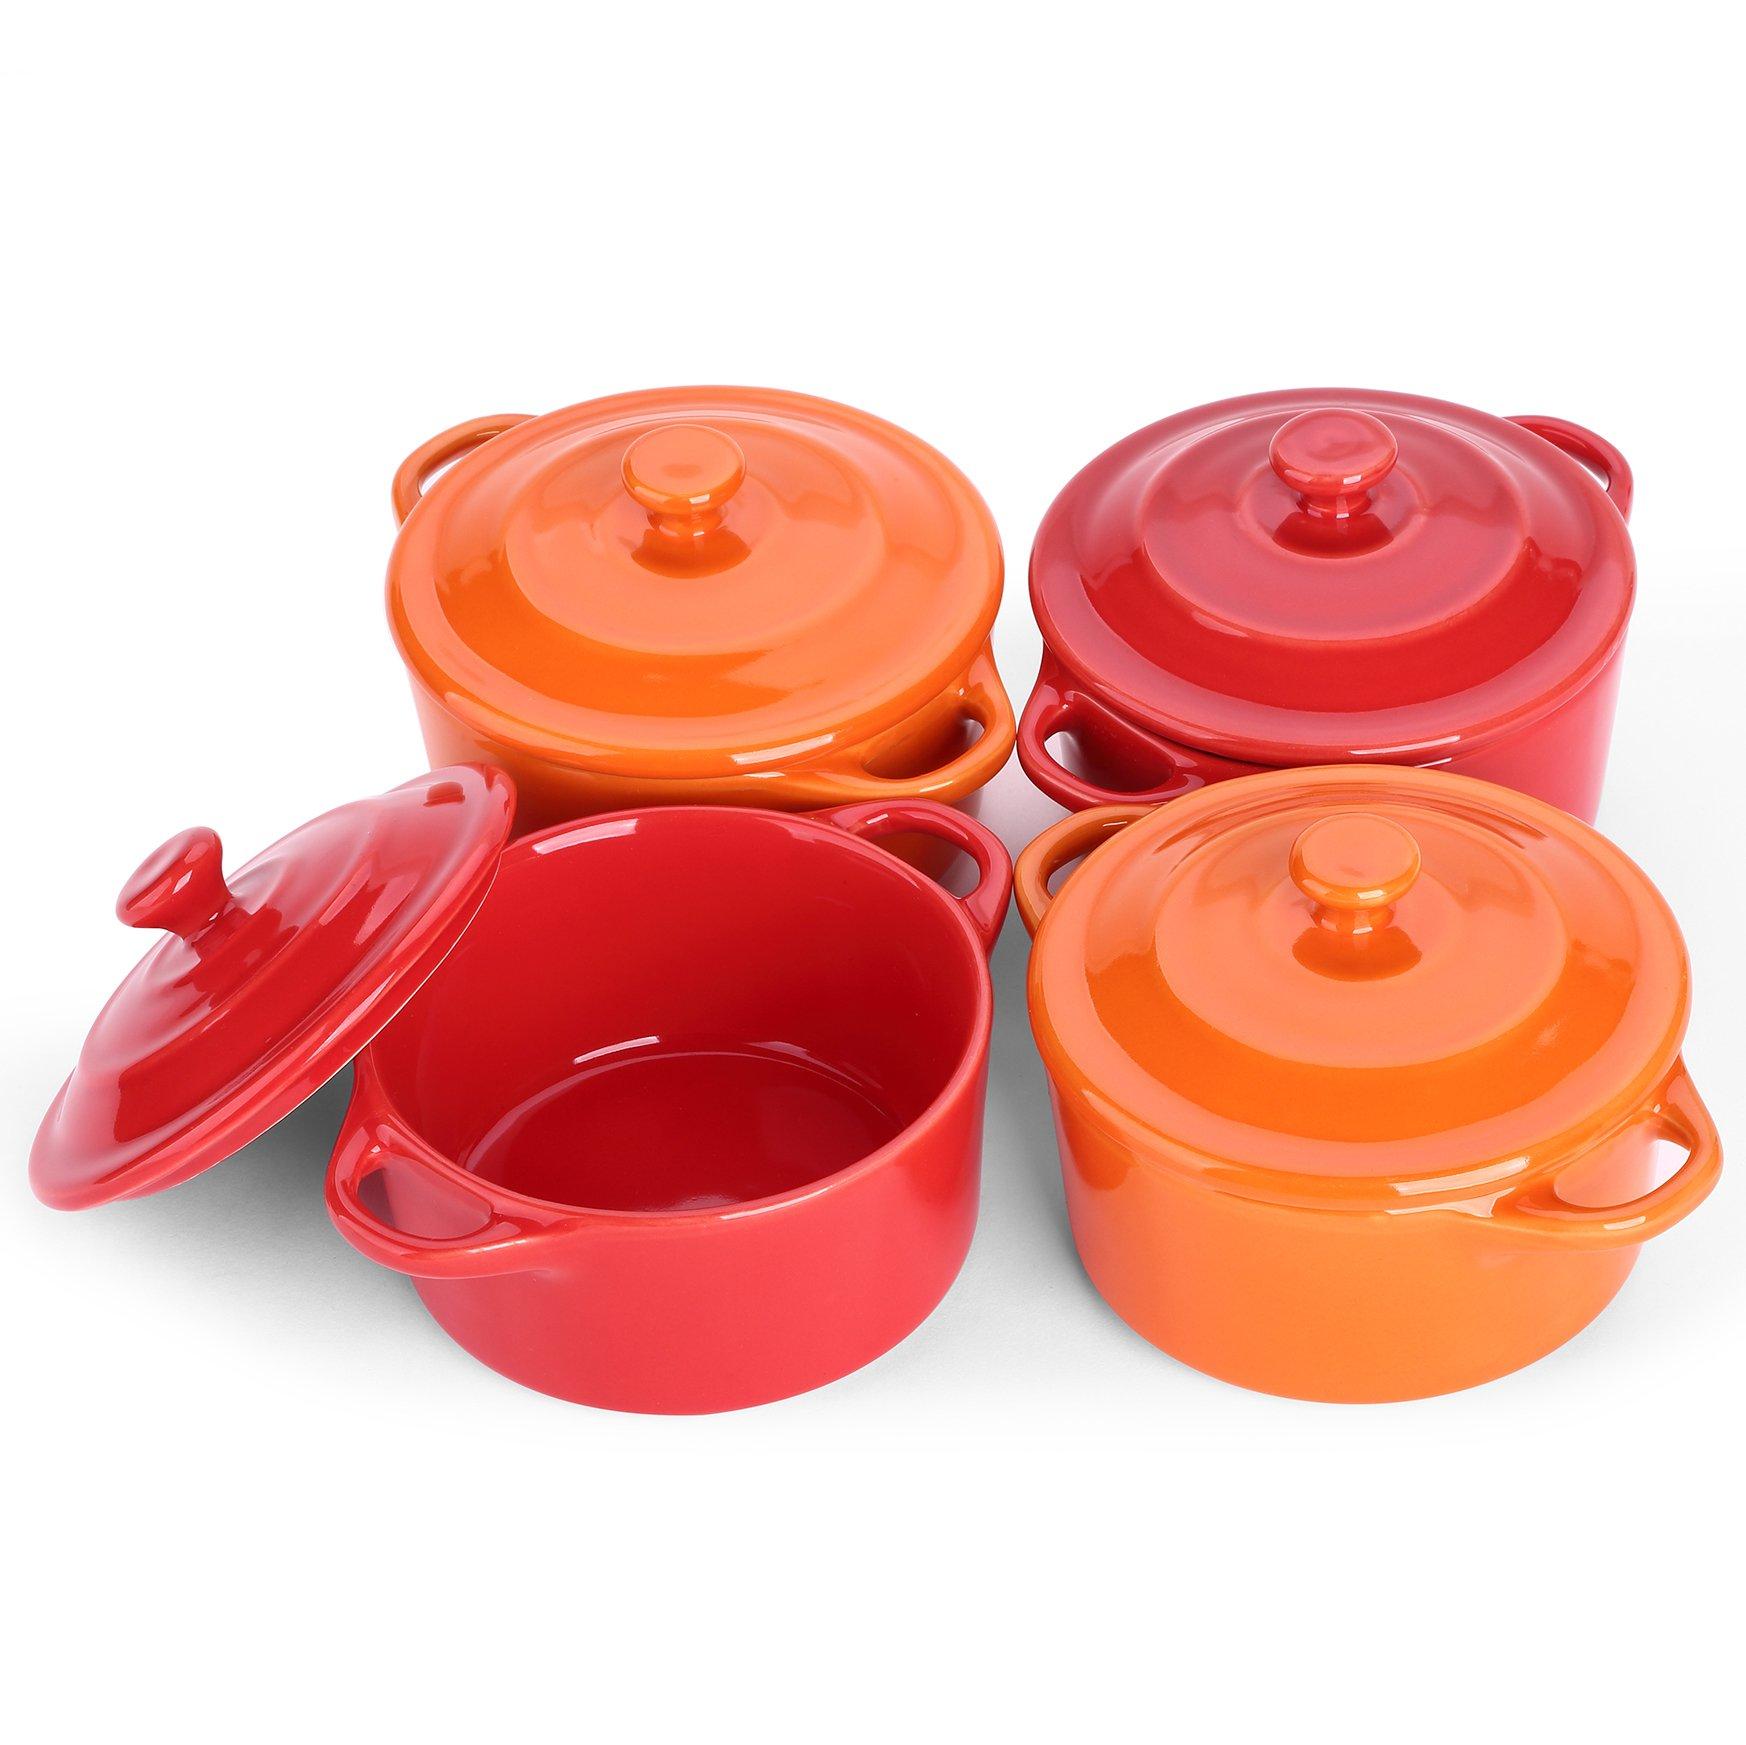 Lifver 7oz Ceramic Soufflé Dish/Mini Casserole/Ramekins, Dip Bowls-4 Packs, Cherry Red & Orange, Round.